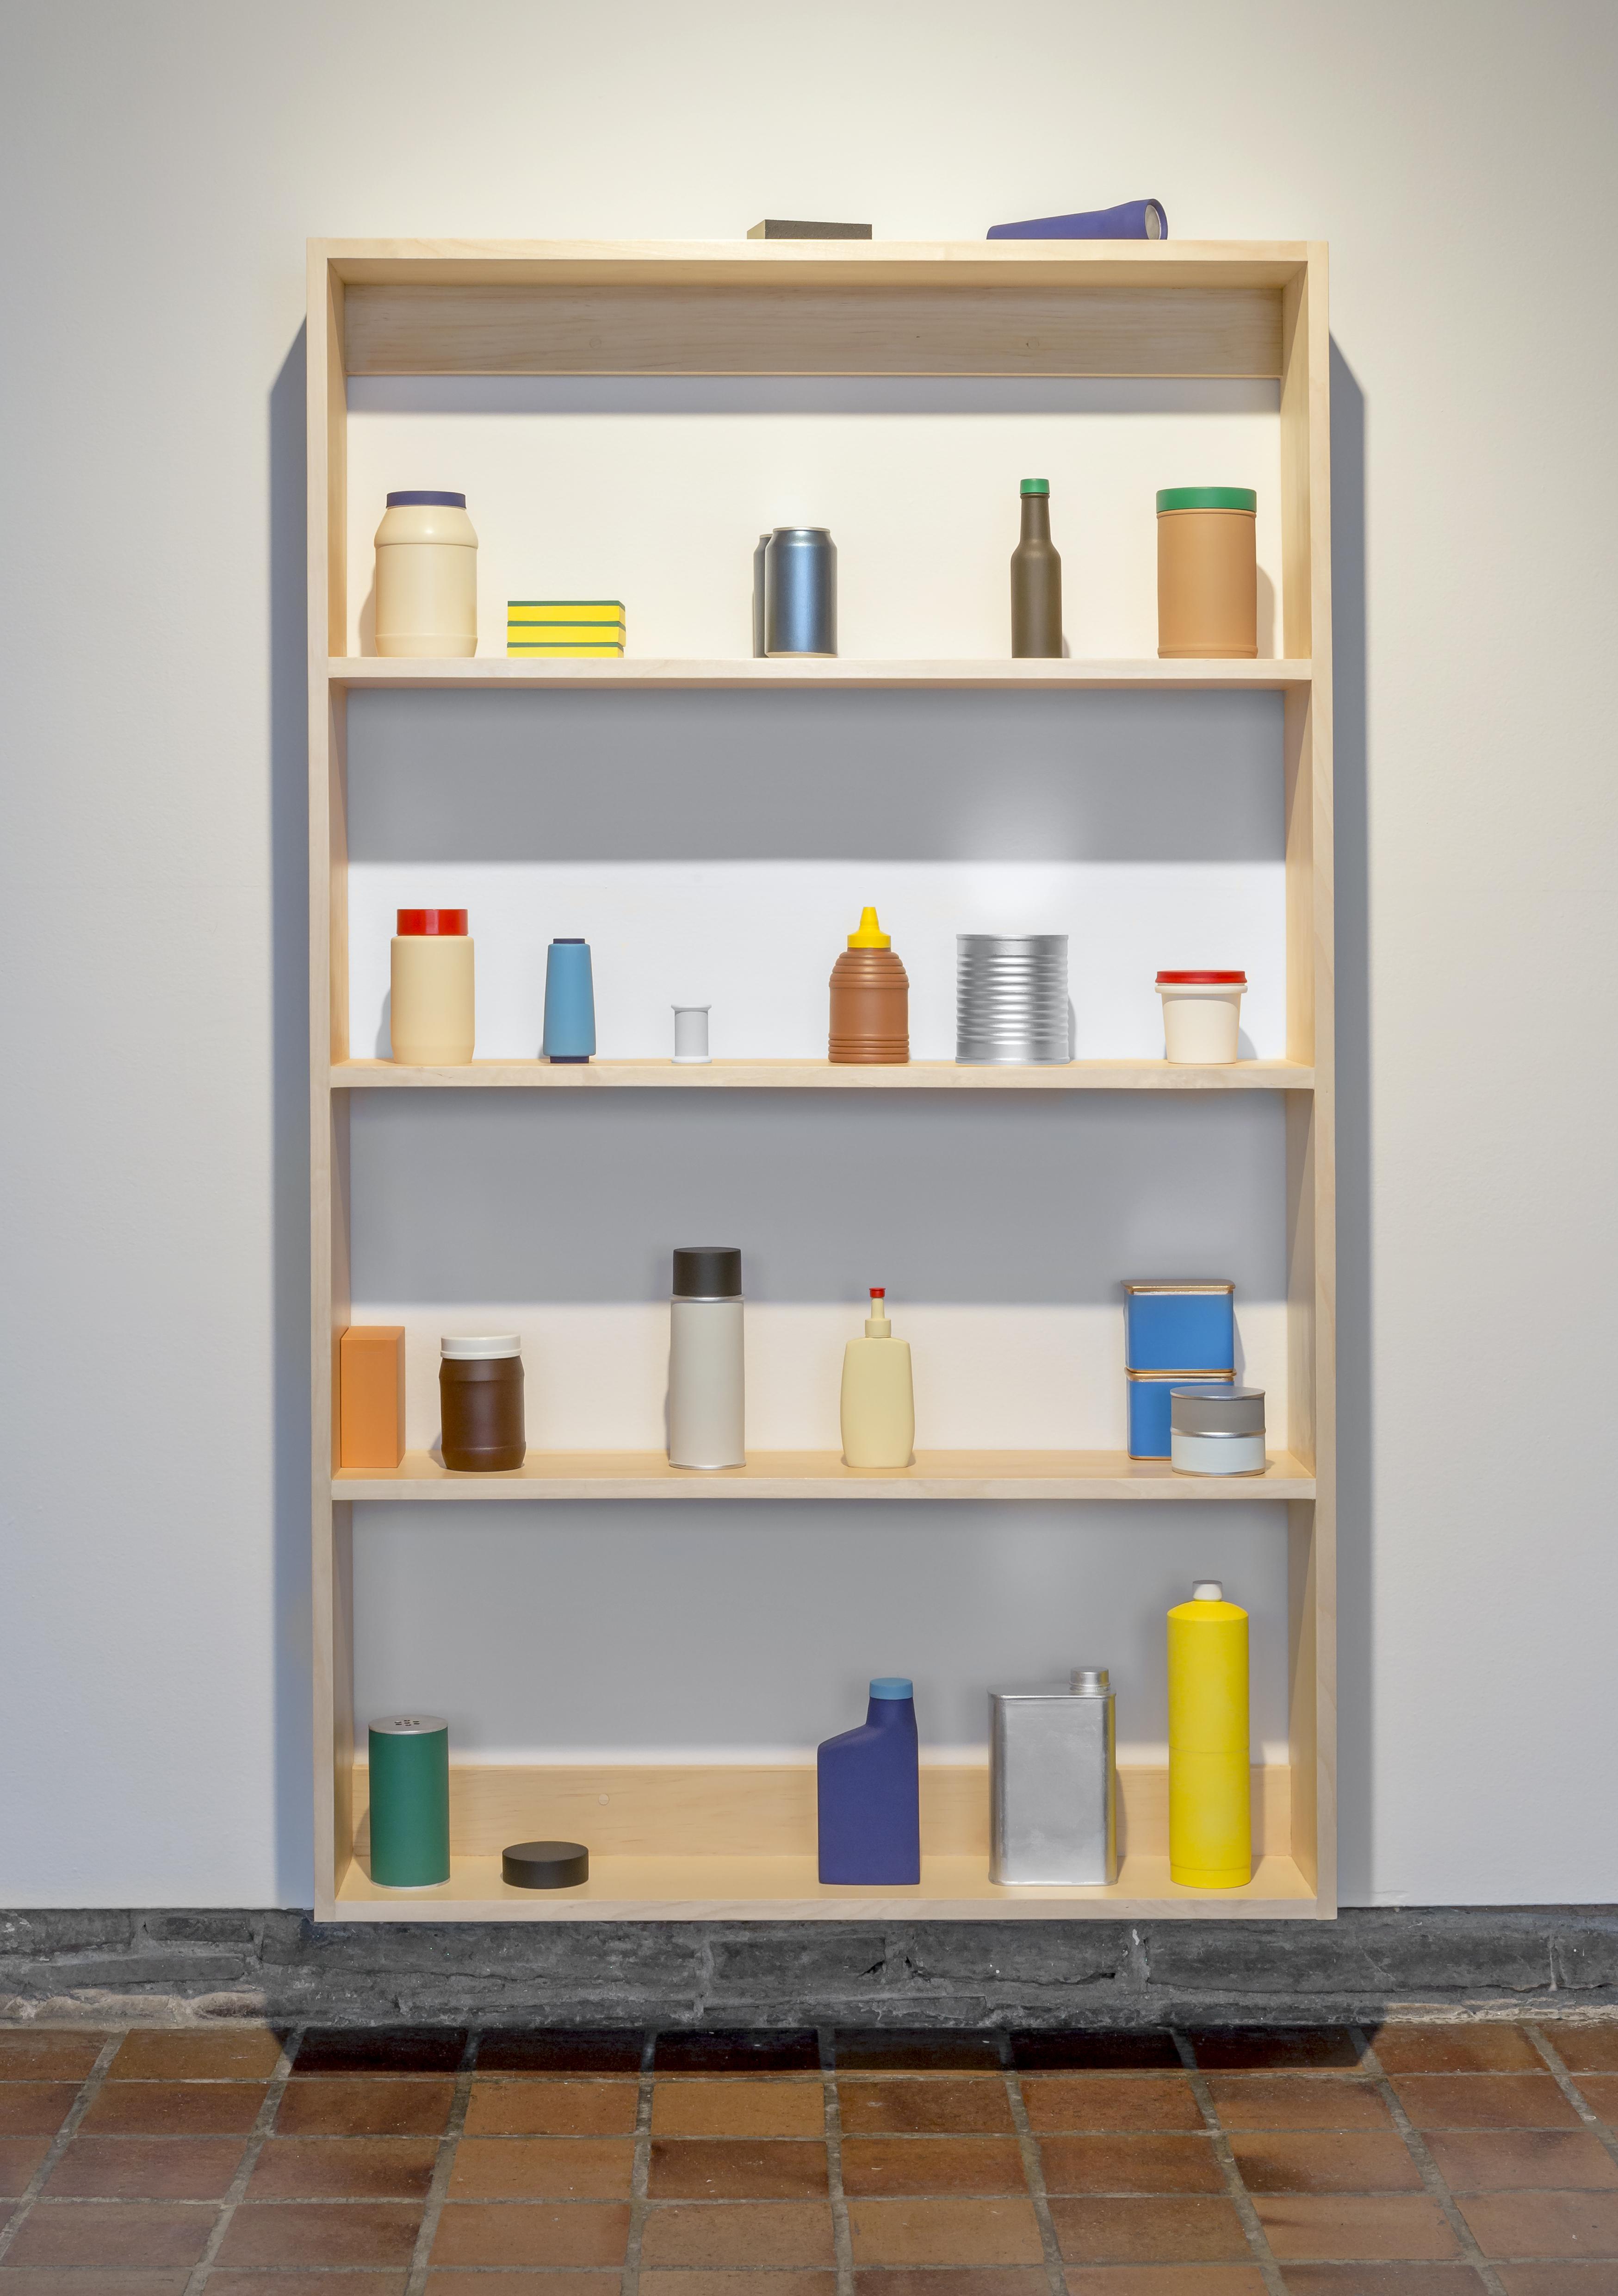 Storage Shelf, 2015 | acrylic on wood and MDF | photo credit: Toni Hafkenscheid